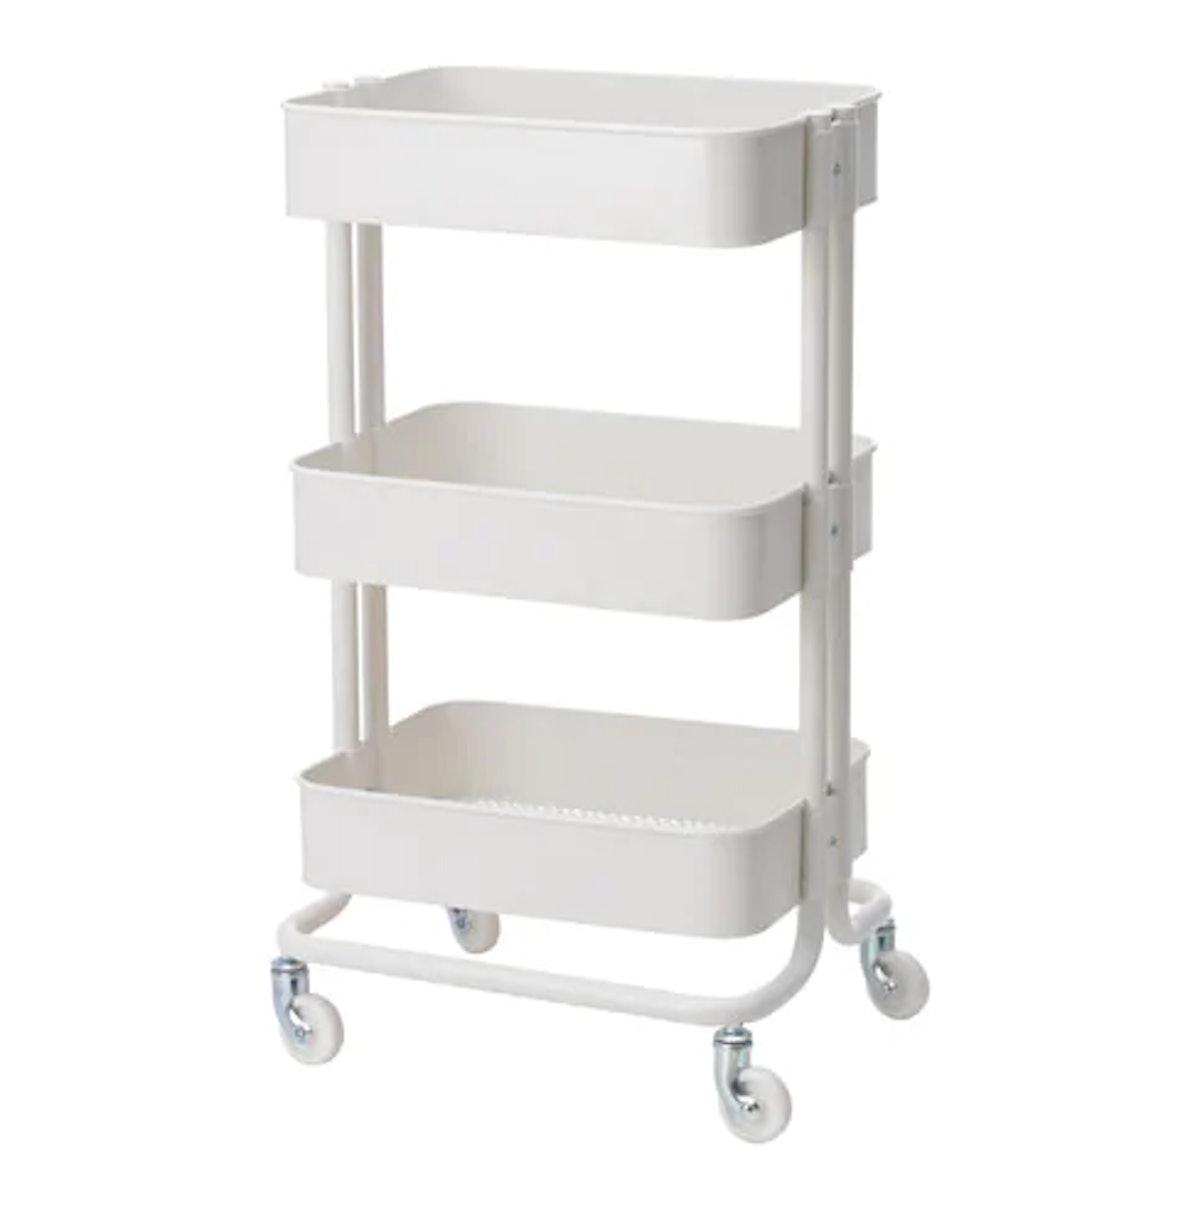 RÅSKOG Utility cart, white